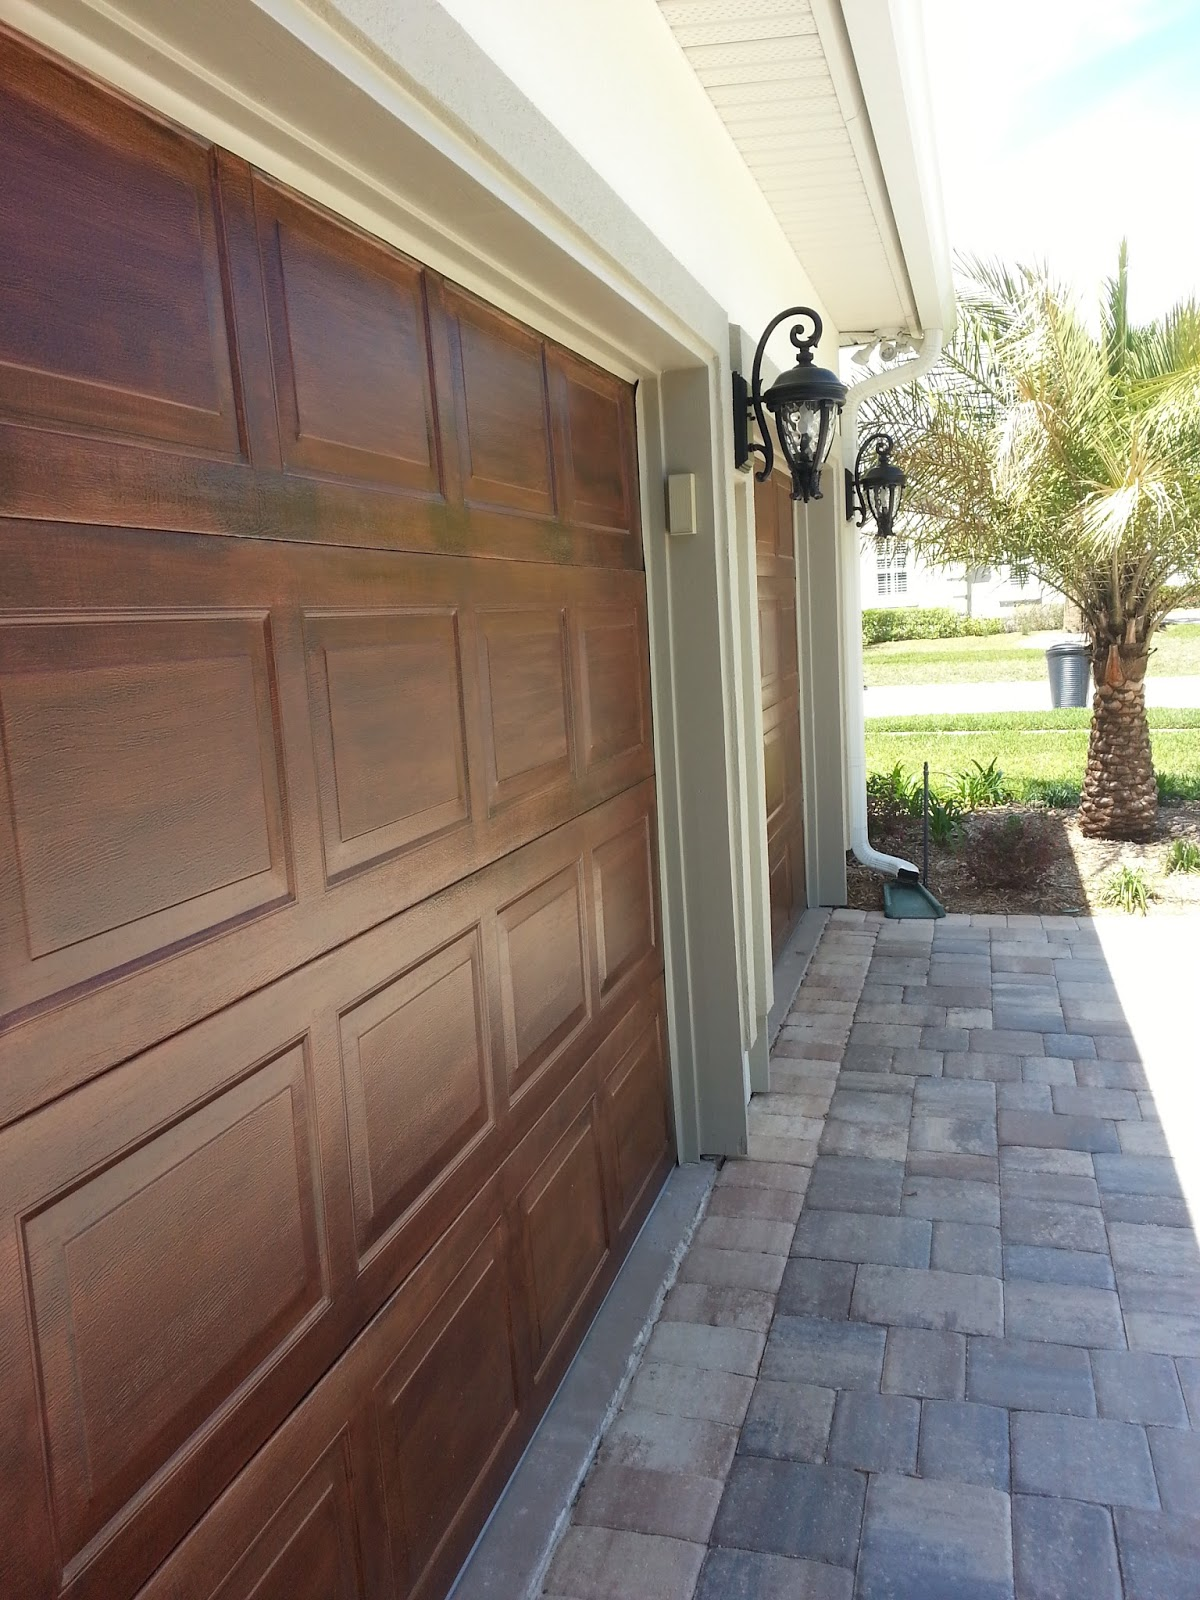 Repair garage door cables in los angeles custom gate for Long beach garage door repair